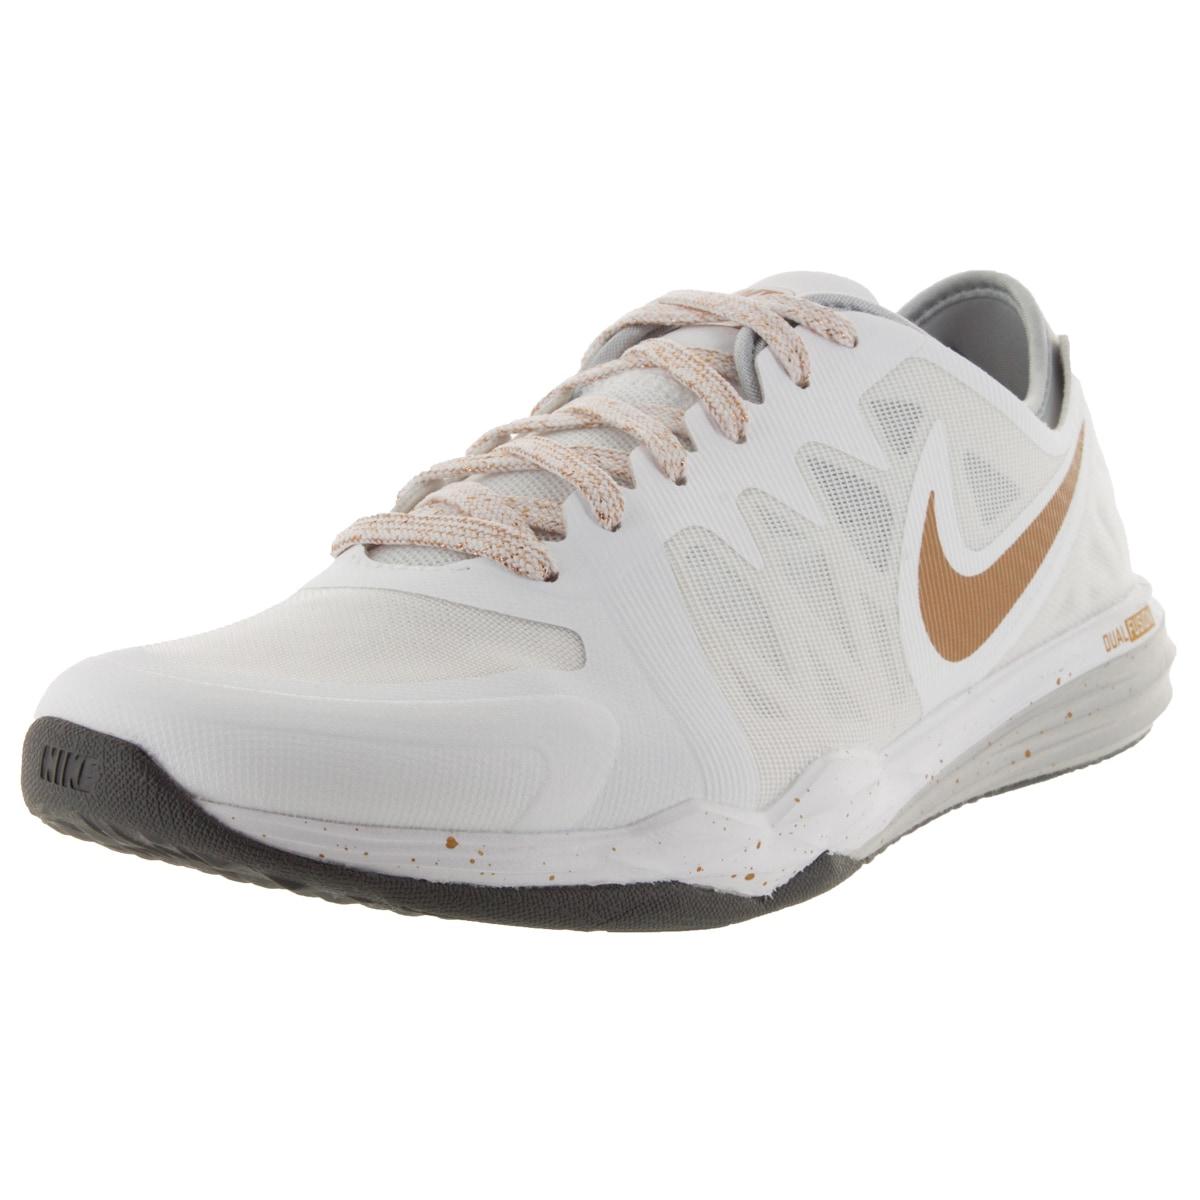 Nike Women's Dual Fusion Tr 3 Print White/Mlc Gld/Wlf G T...